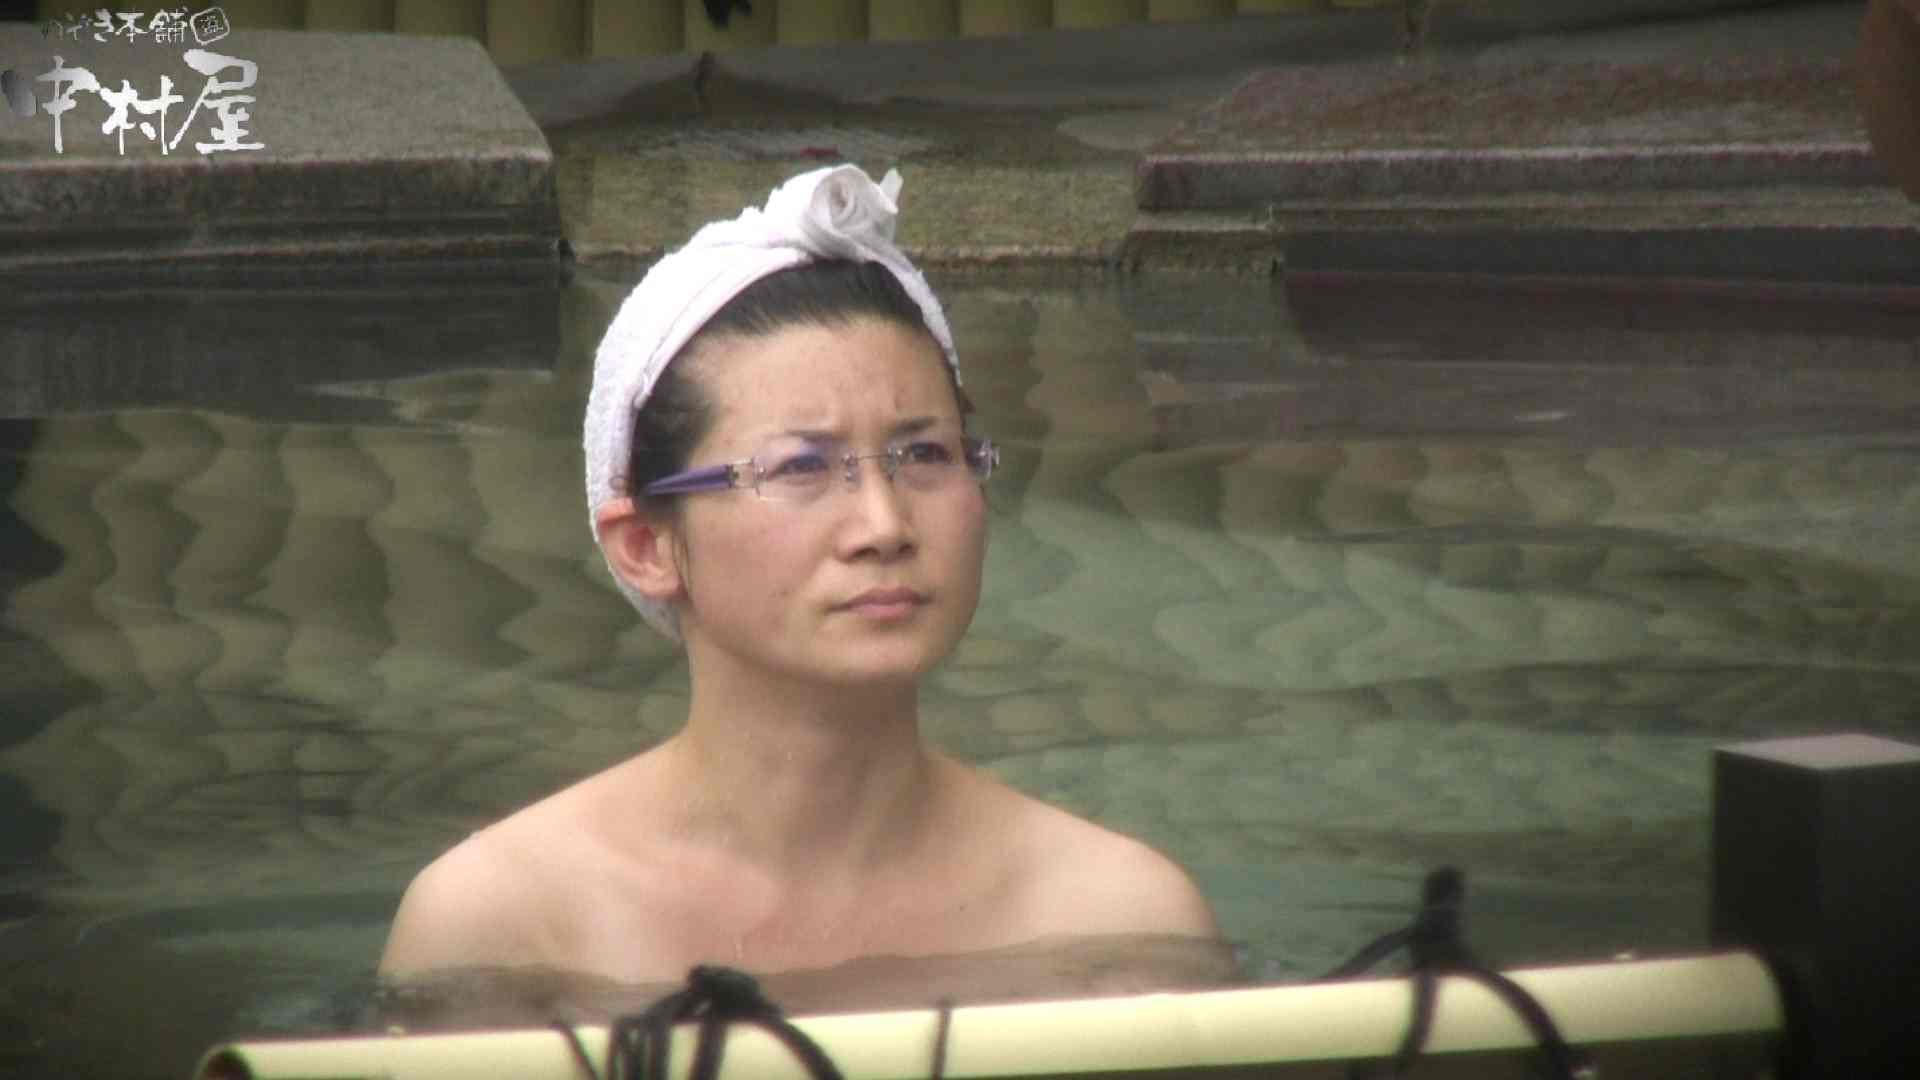 Aquaな露天風呂Vol.905 OLセックス  71画像 24